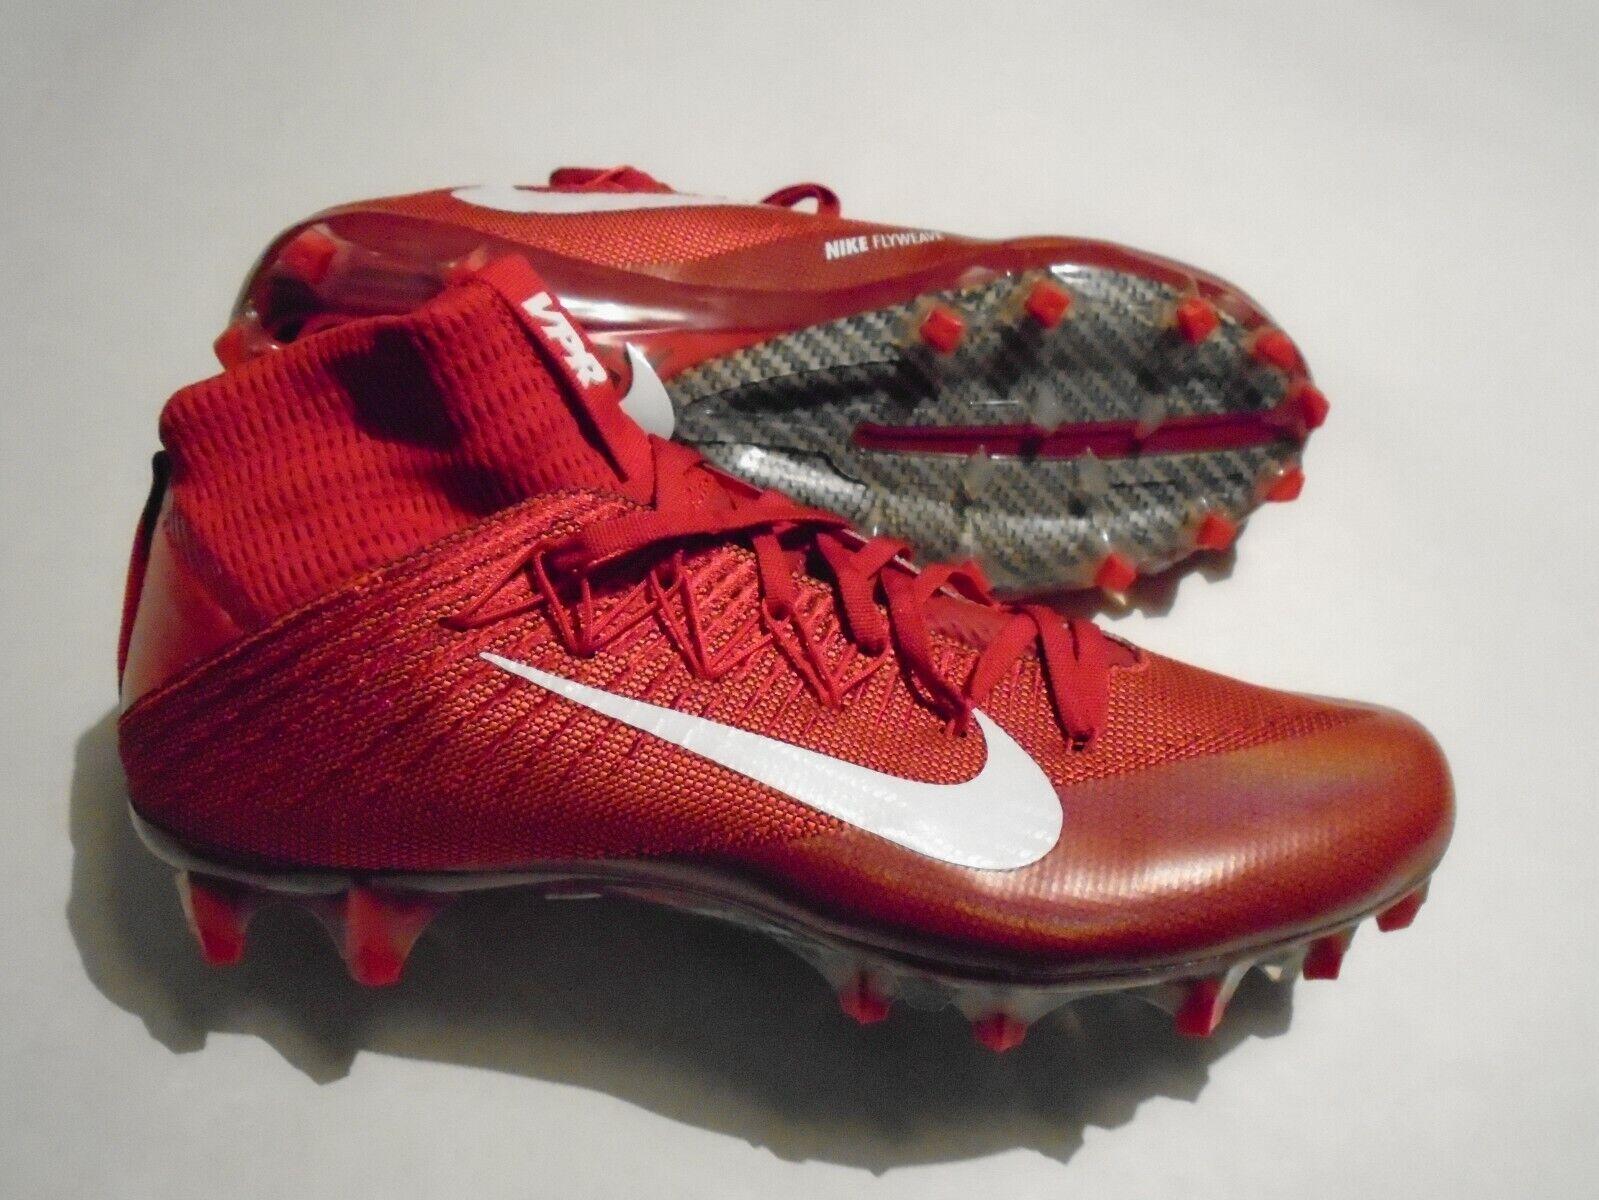 New Nike Vapor Untouchable 2 Men's 10 University Red Football Cleats 824470 616